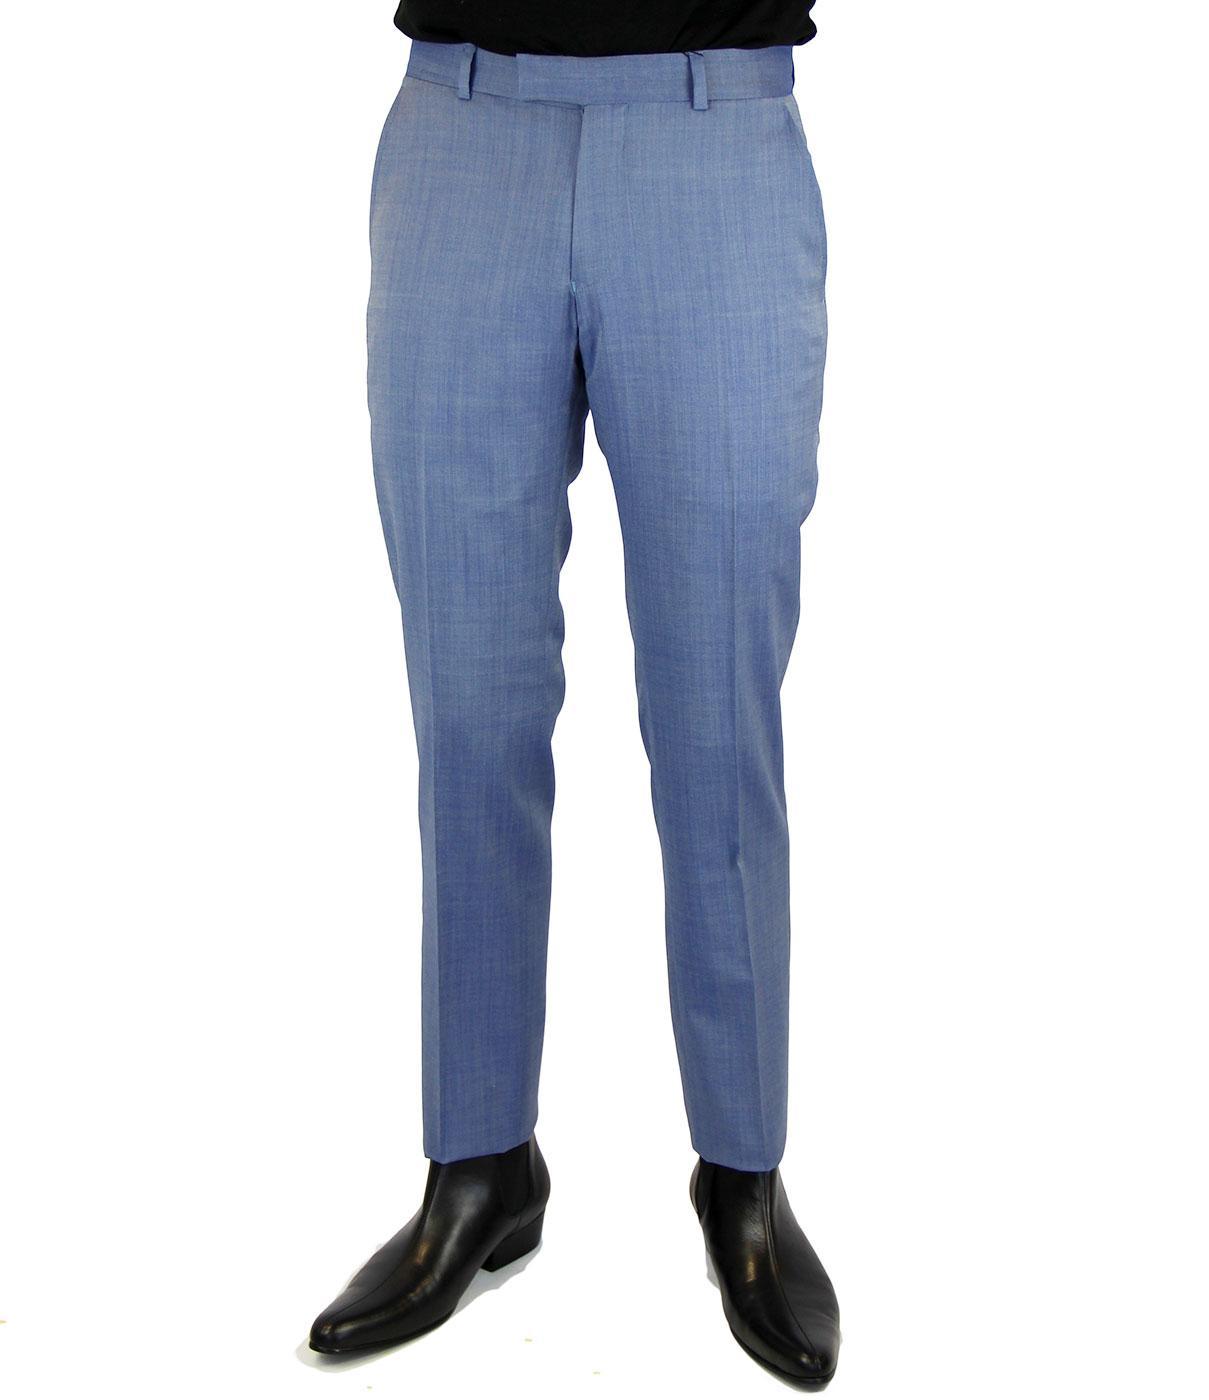 BEN SHERMAN Tailoring Mod Slim Tonic Trousers (WB)